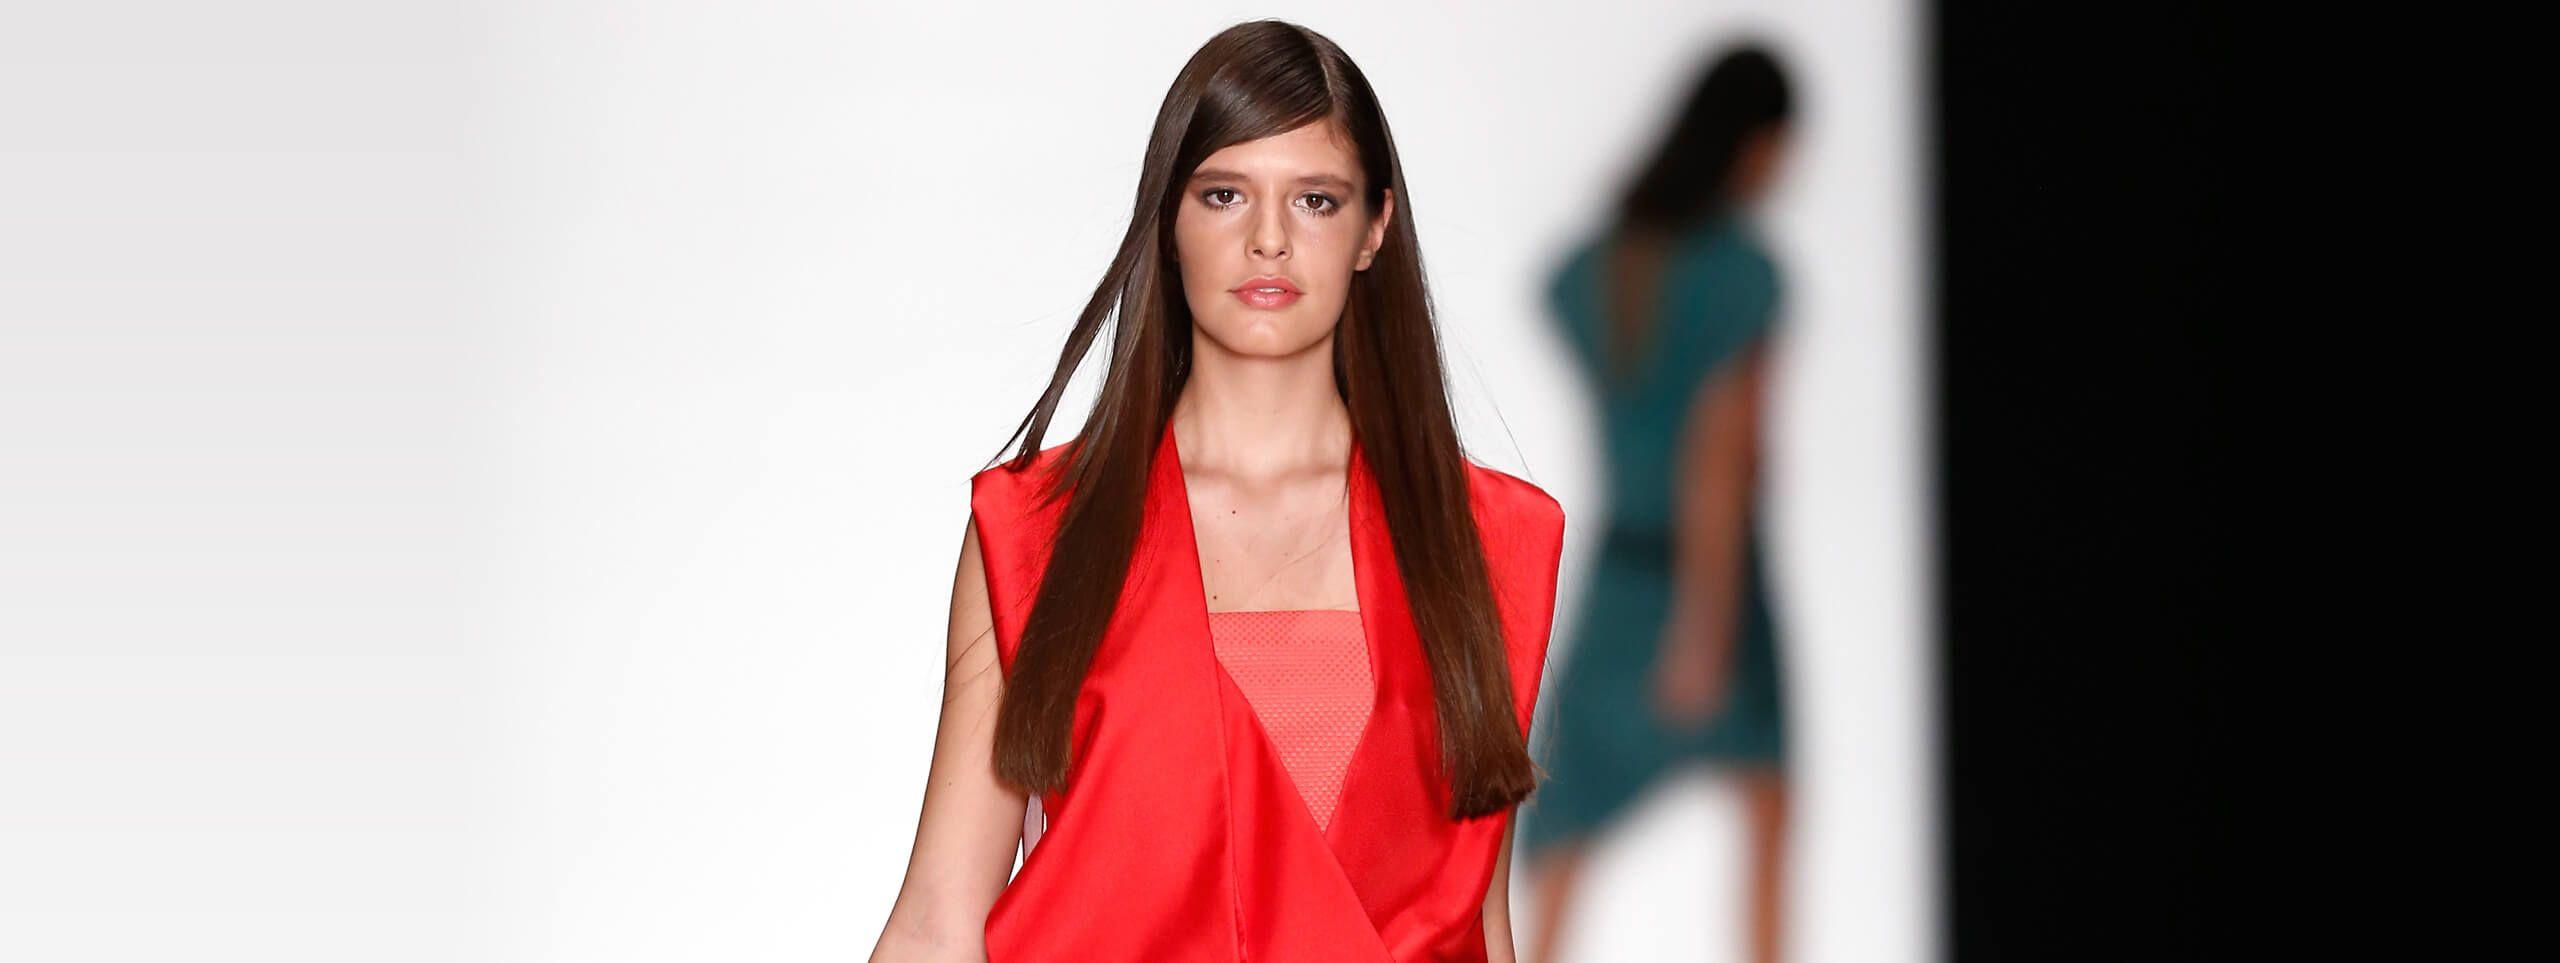 Modella Julia Dalakian acconciatura capelli lunghi